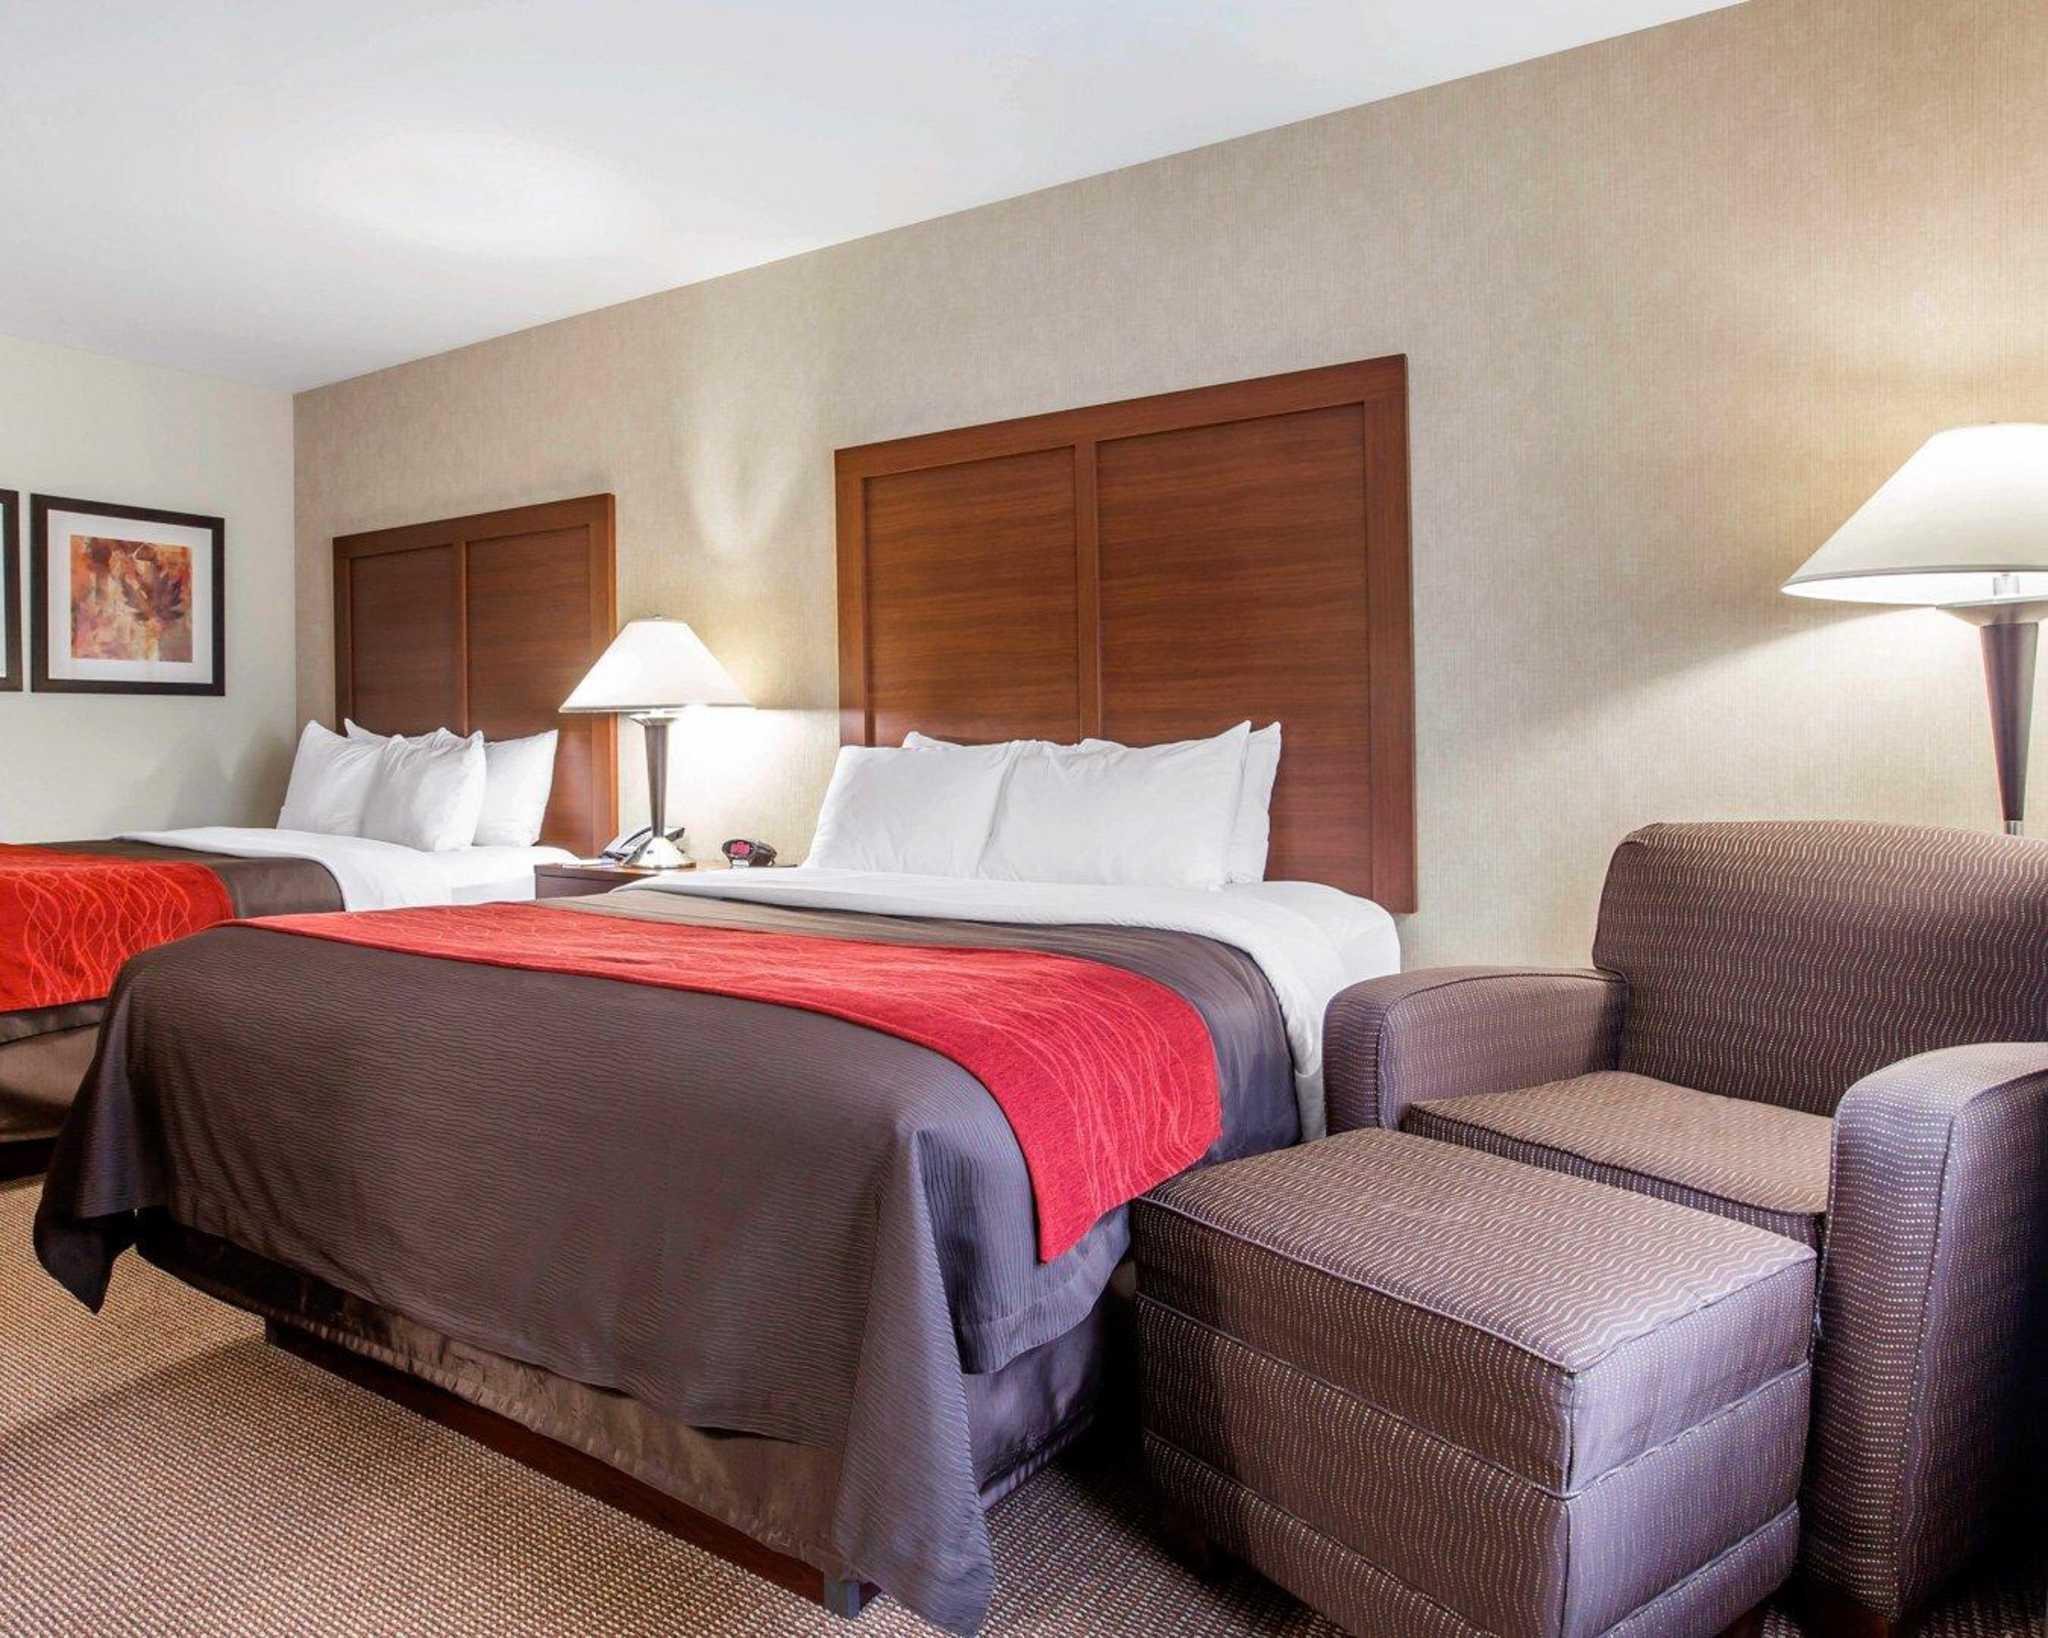 Comfort Inn & Suites adj to Akwesasne Mohawk Casino image 16